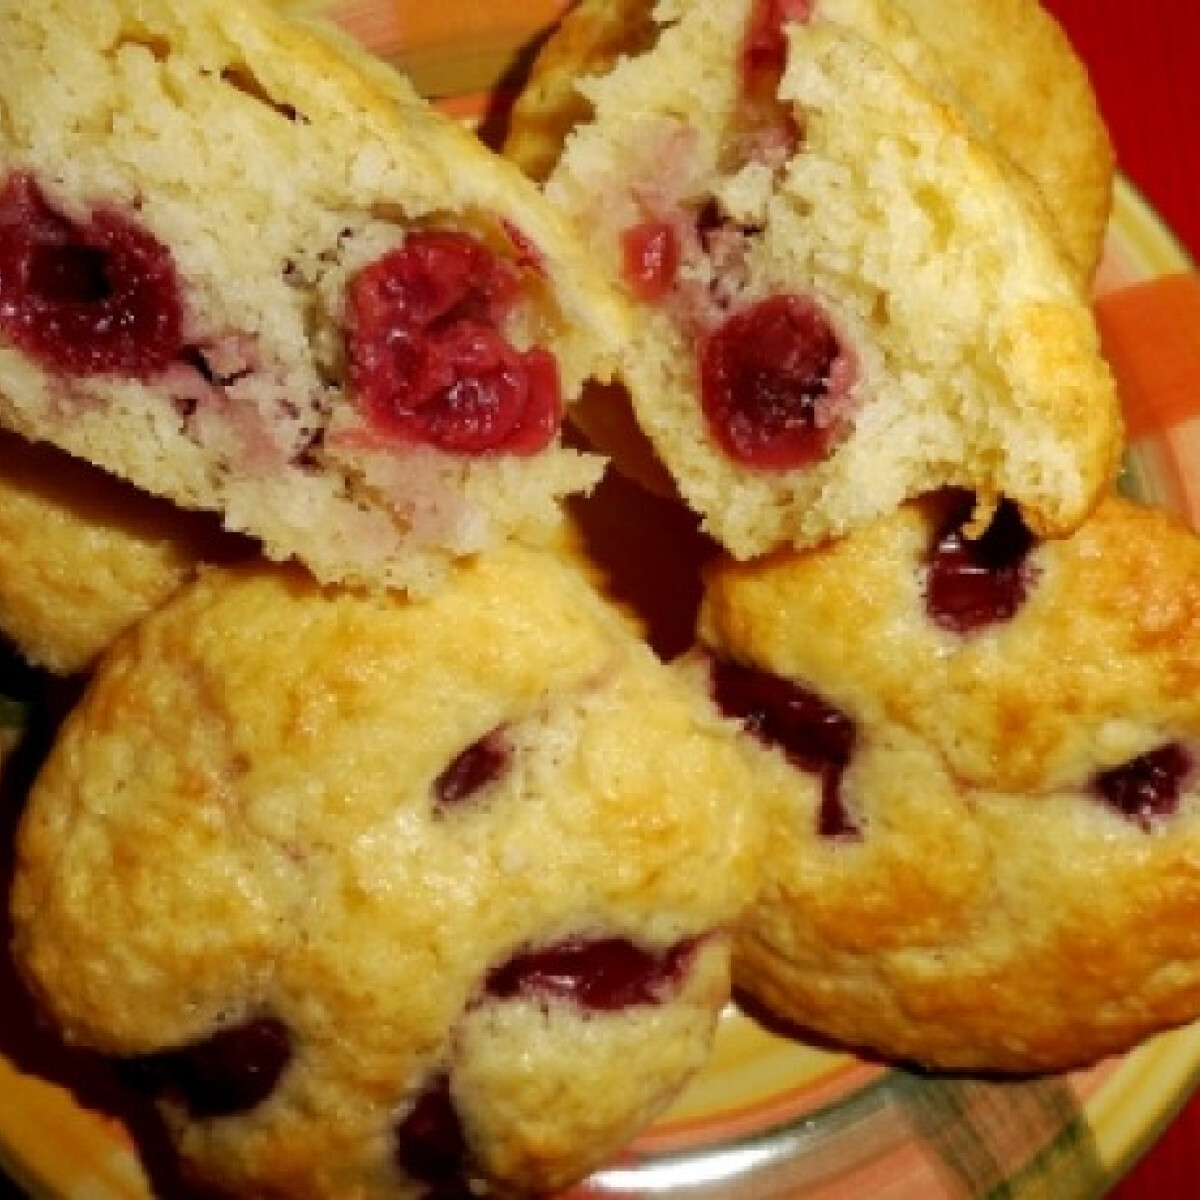 Kókuszos-meggyes muffin